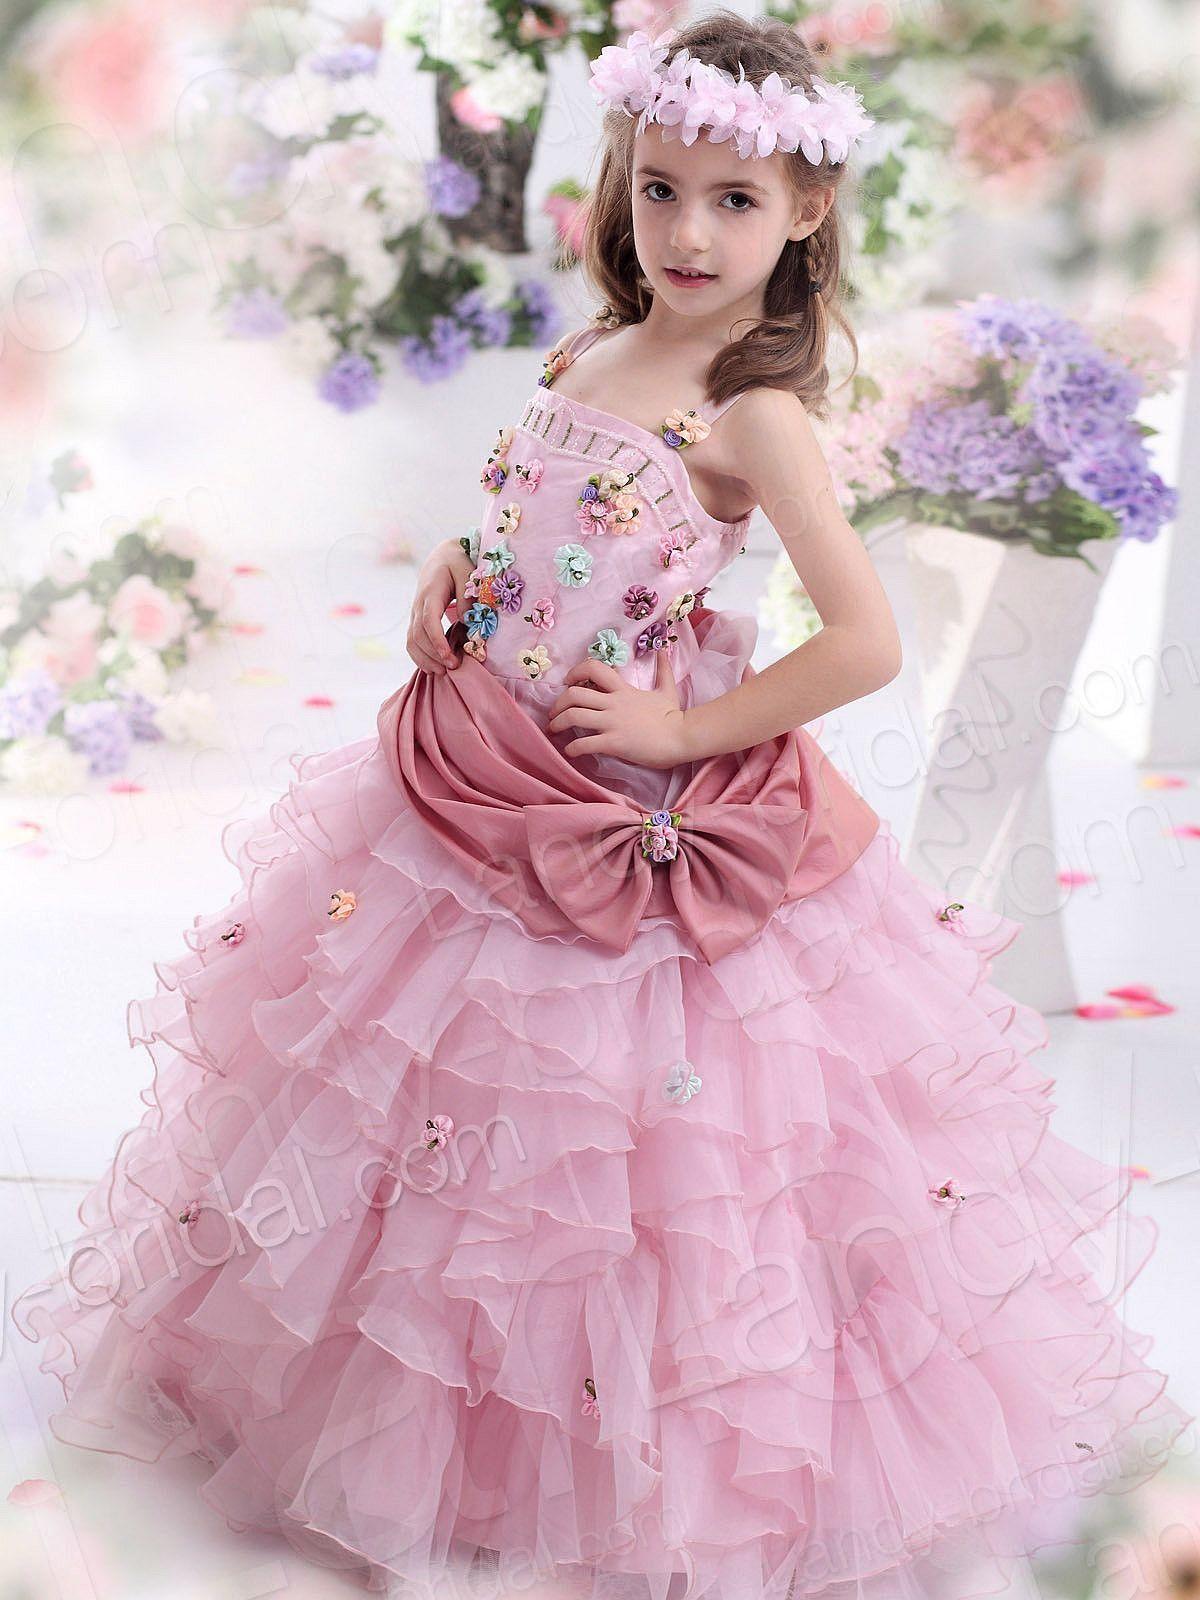 17 Best images about Little Girl Dresses on Pinterest - Little ...